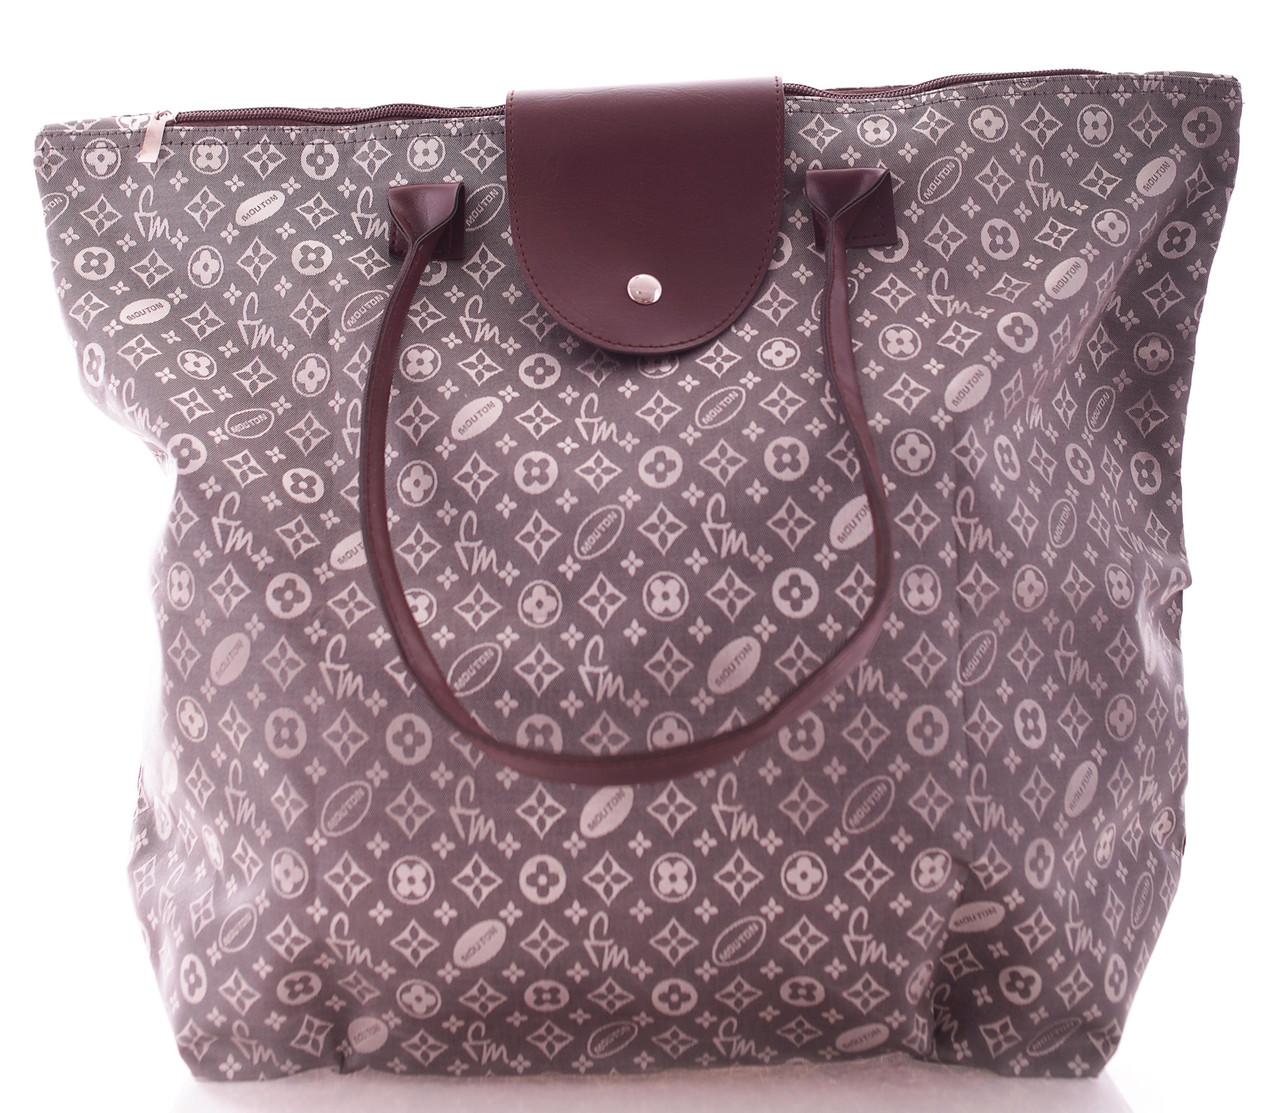 Сумка жіноча текстилю Grey beach bag сіра